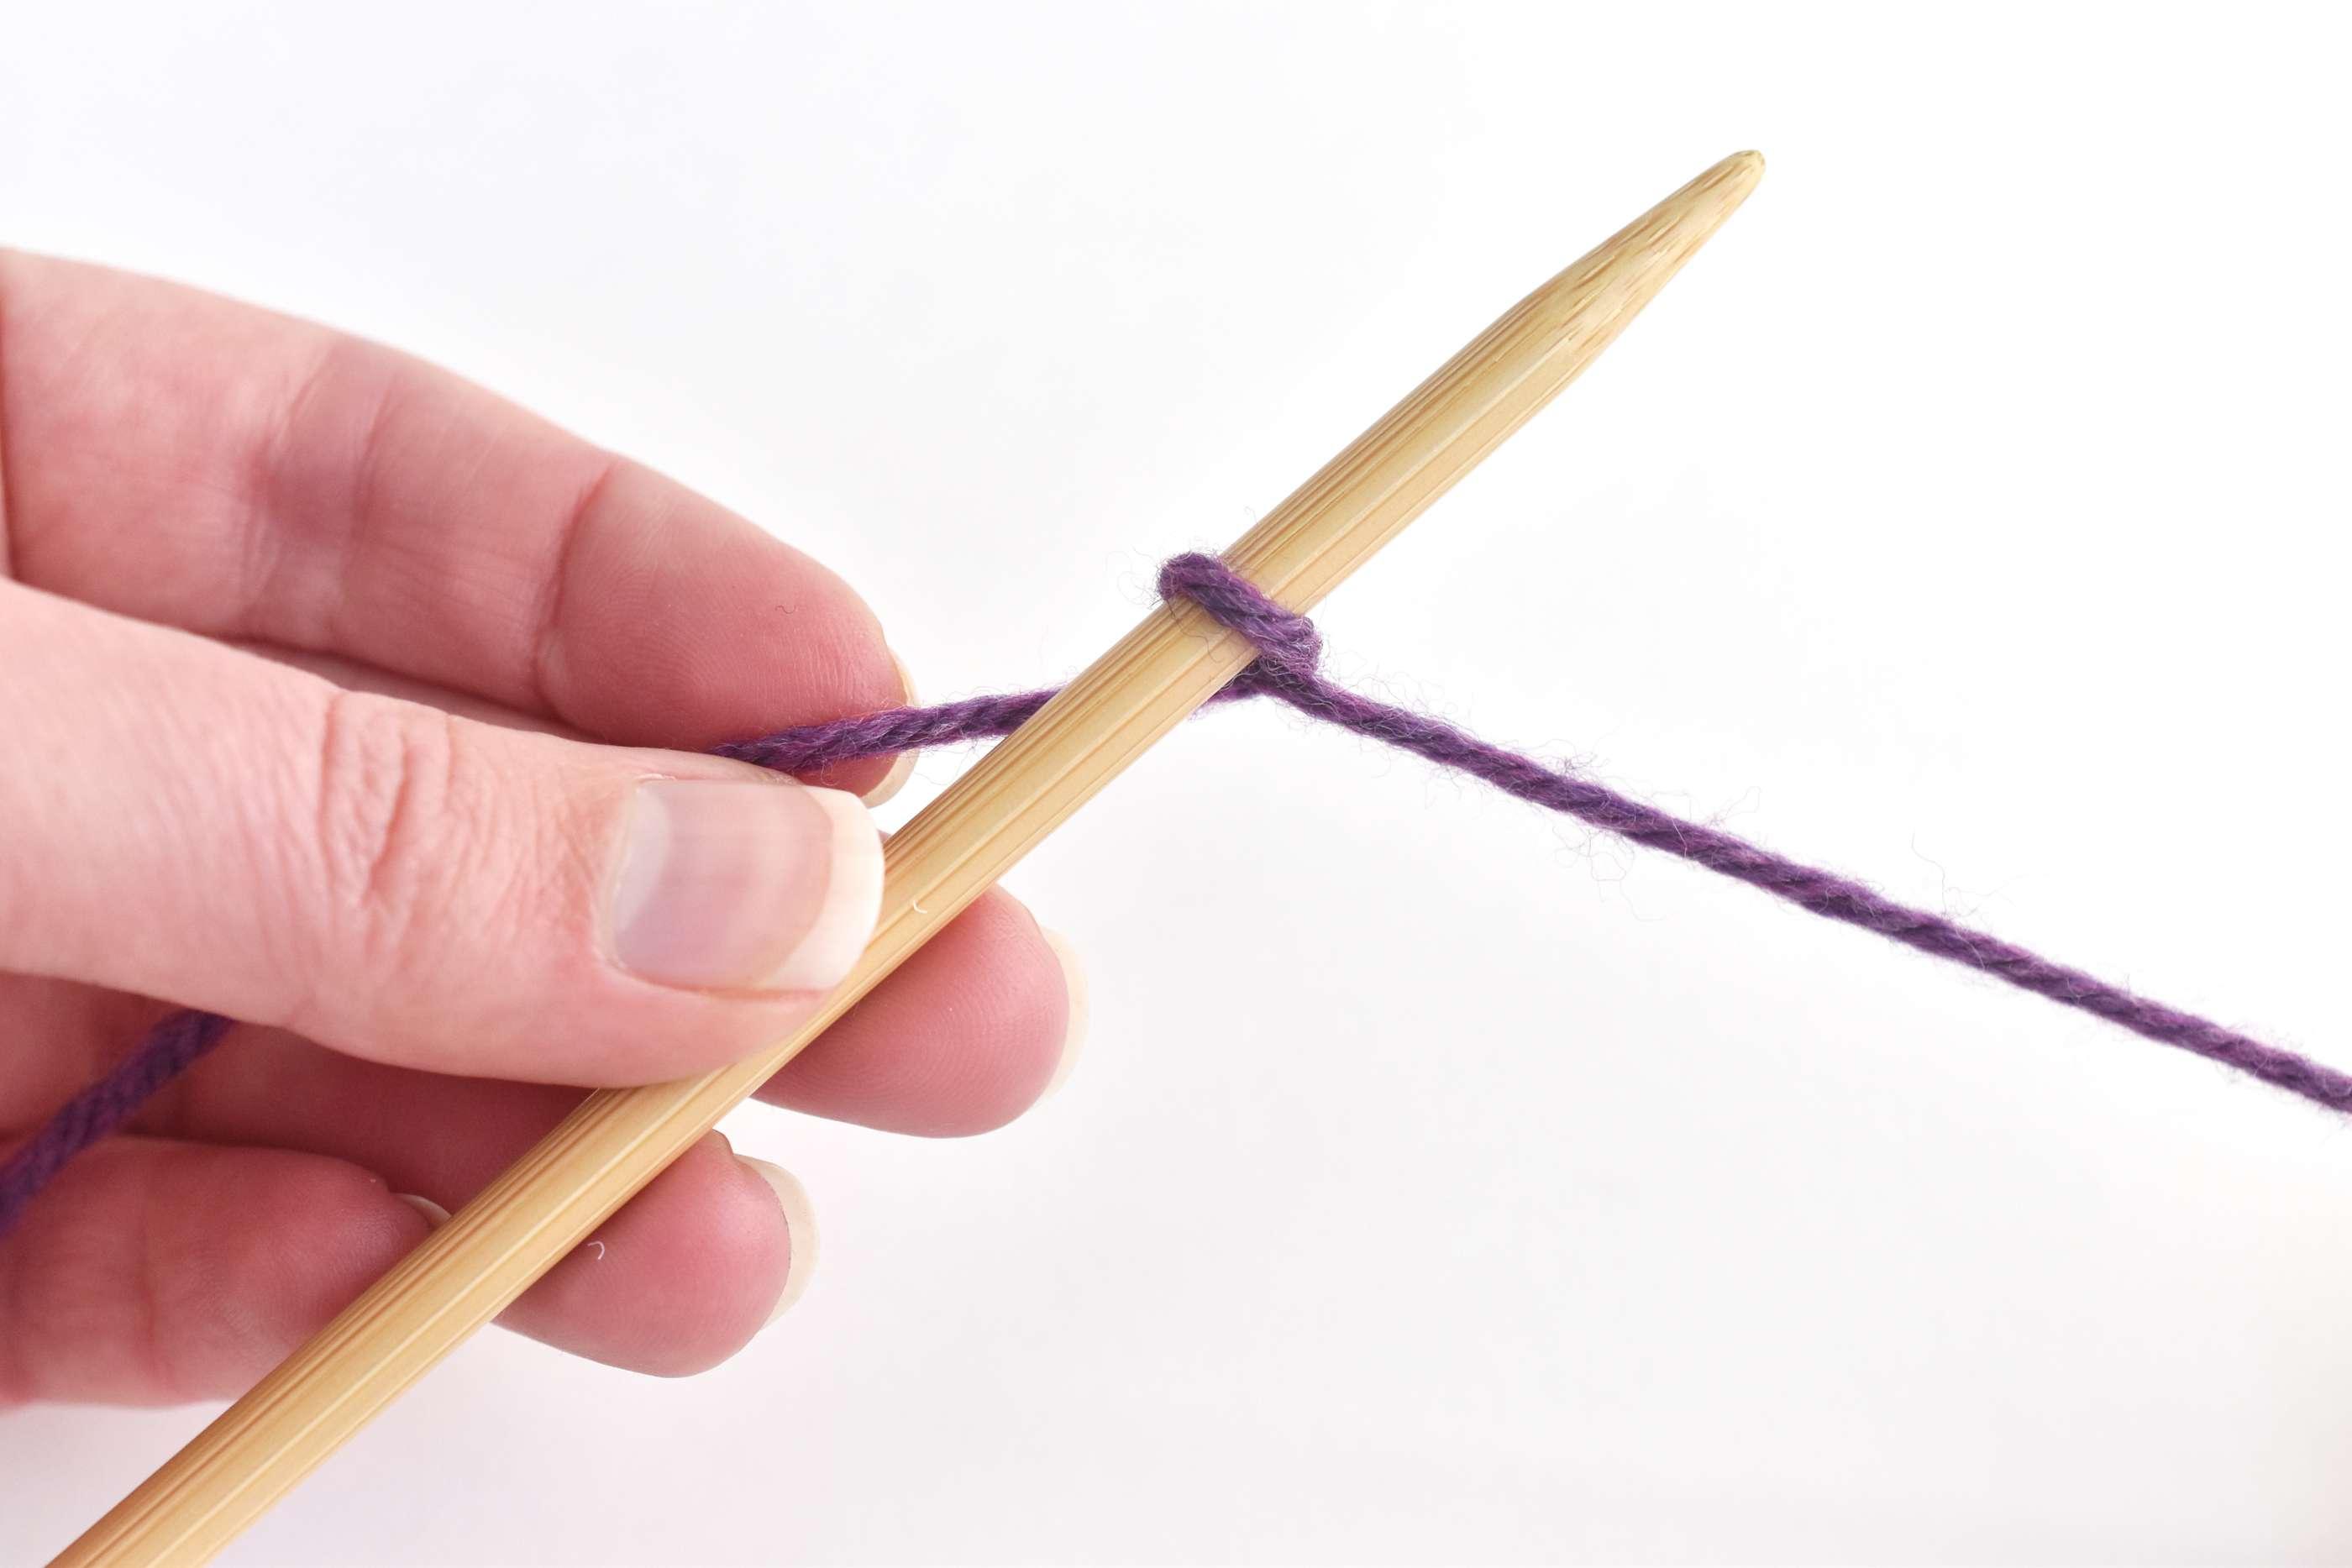 One Stitch on the Needle